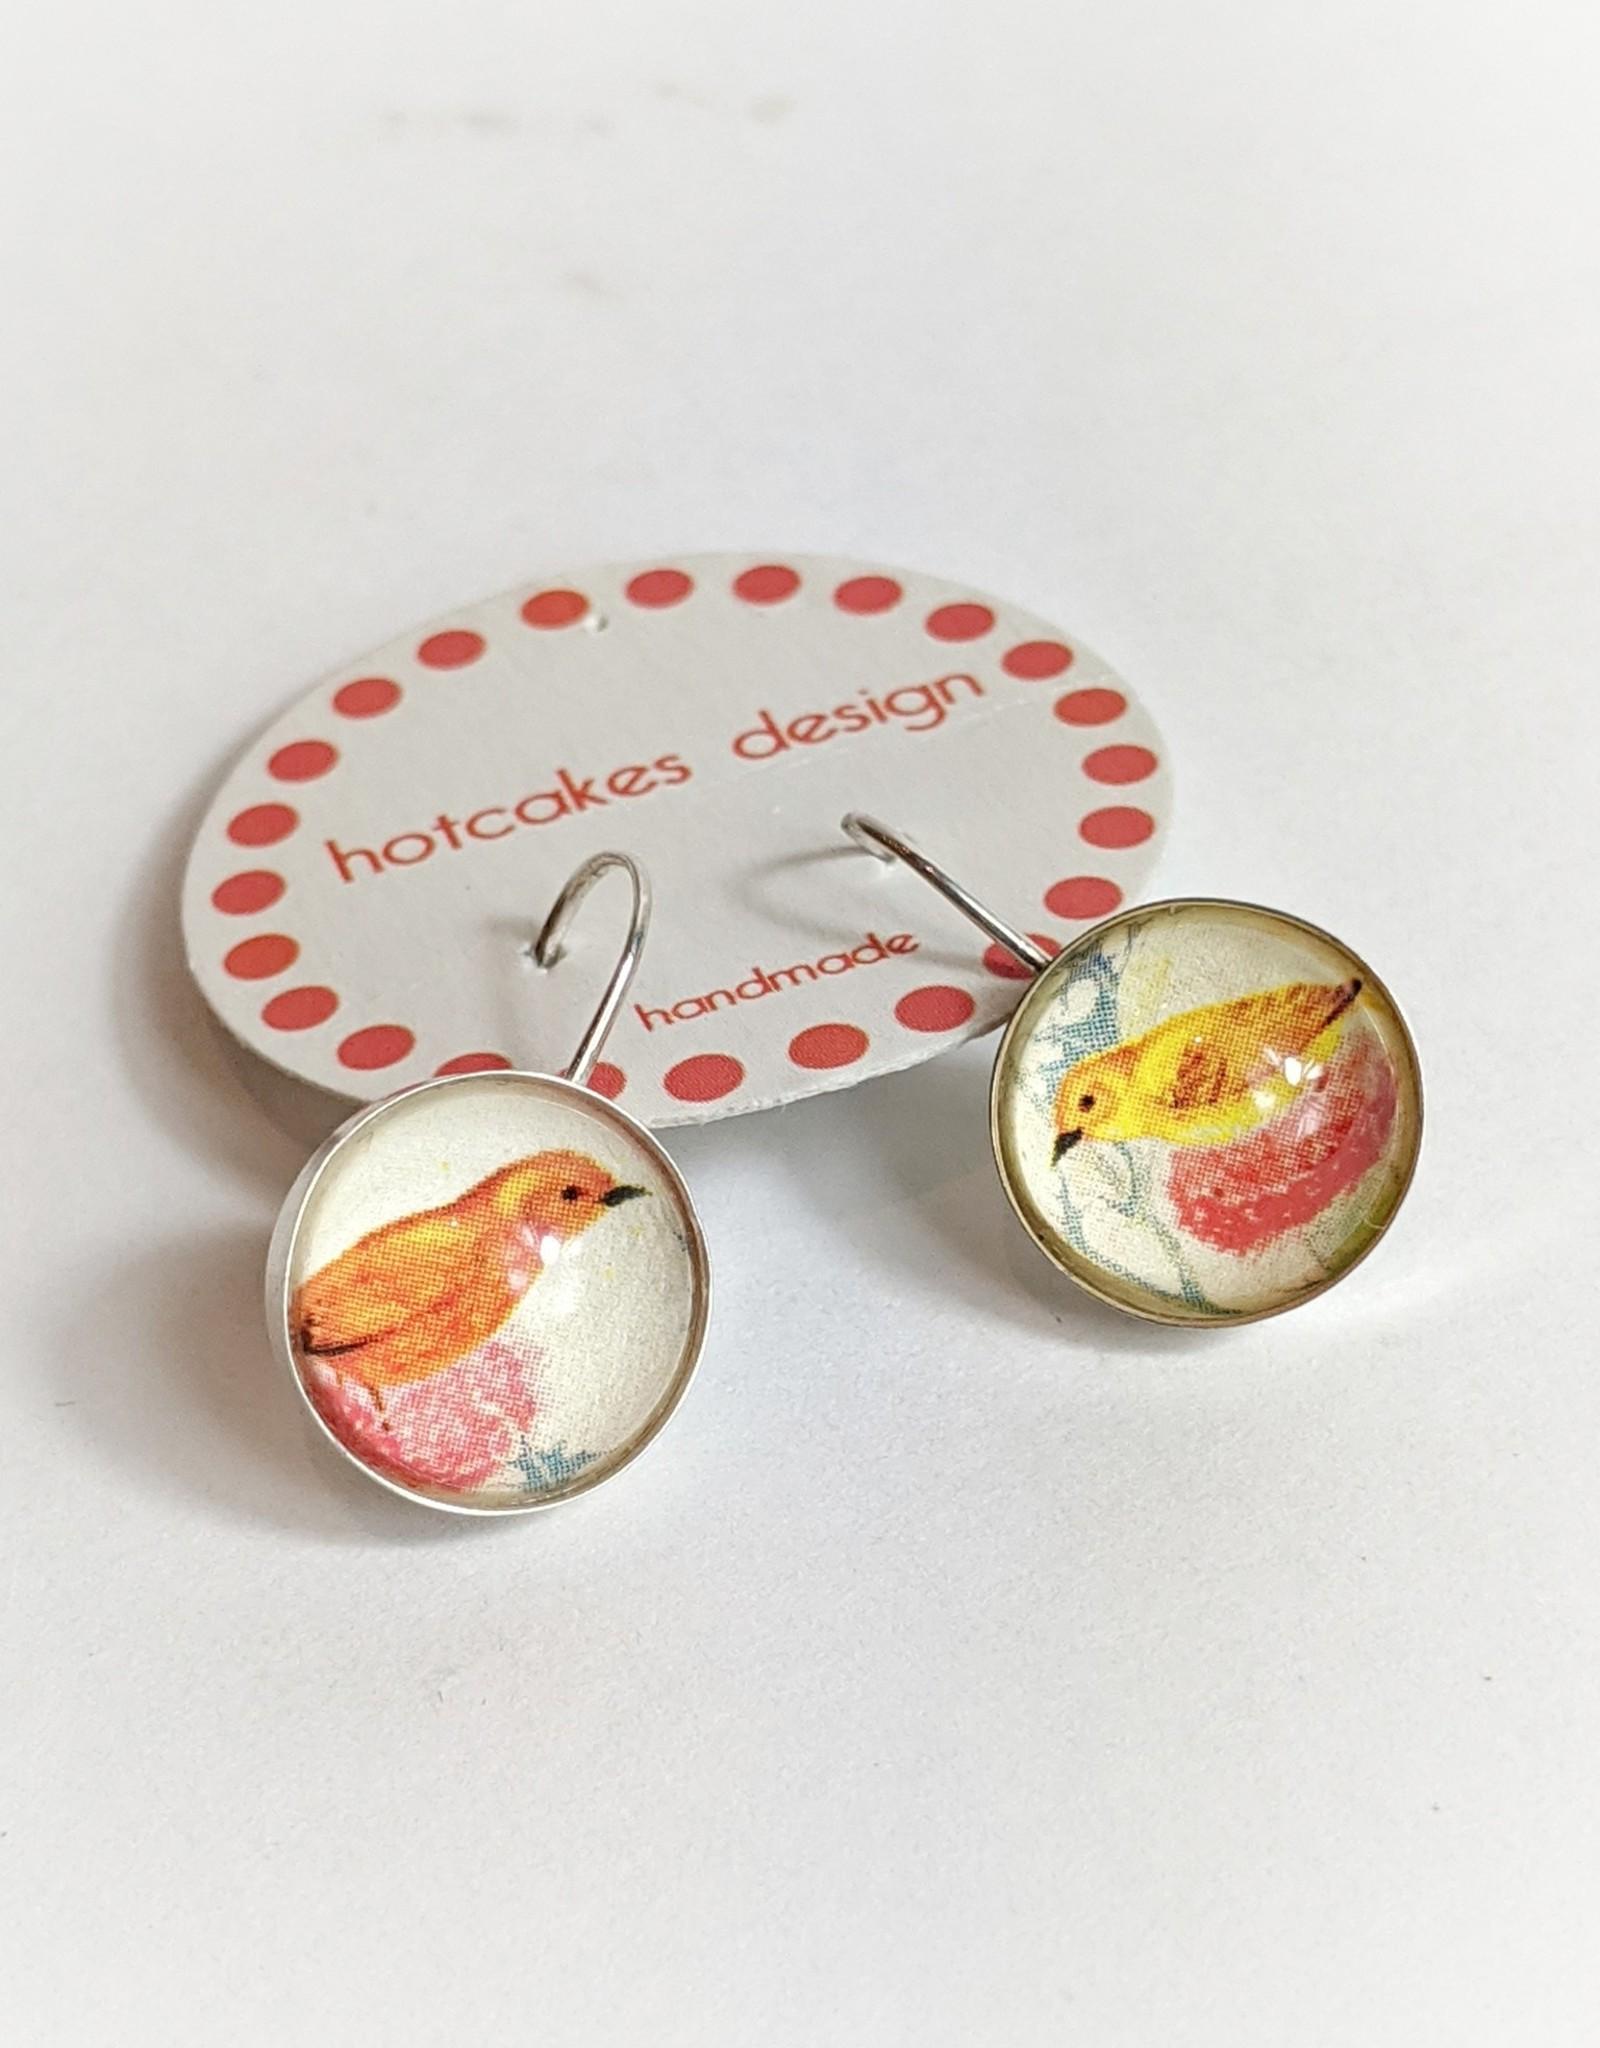 Hotcakes Design Hotcakes Art Earrings